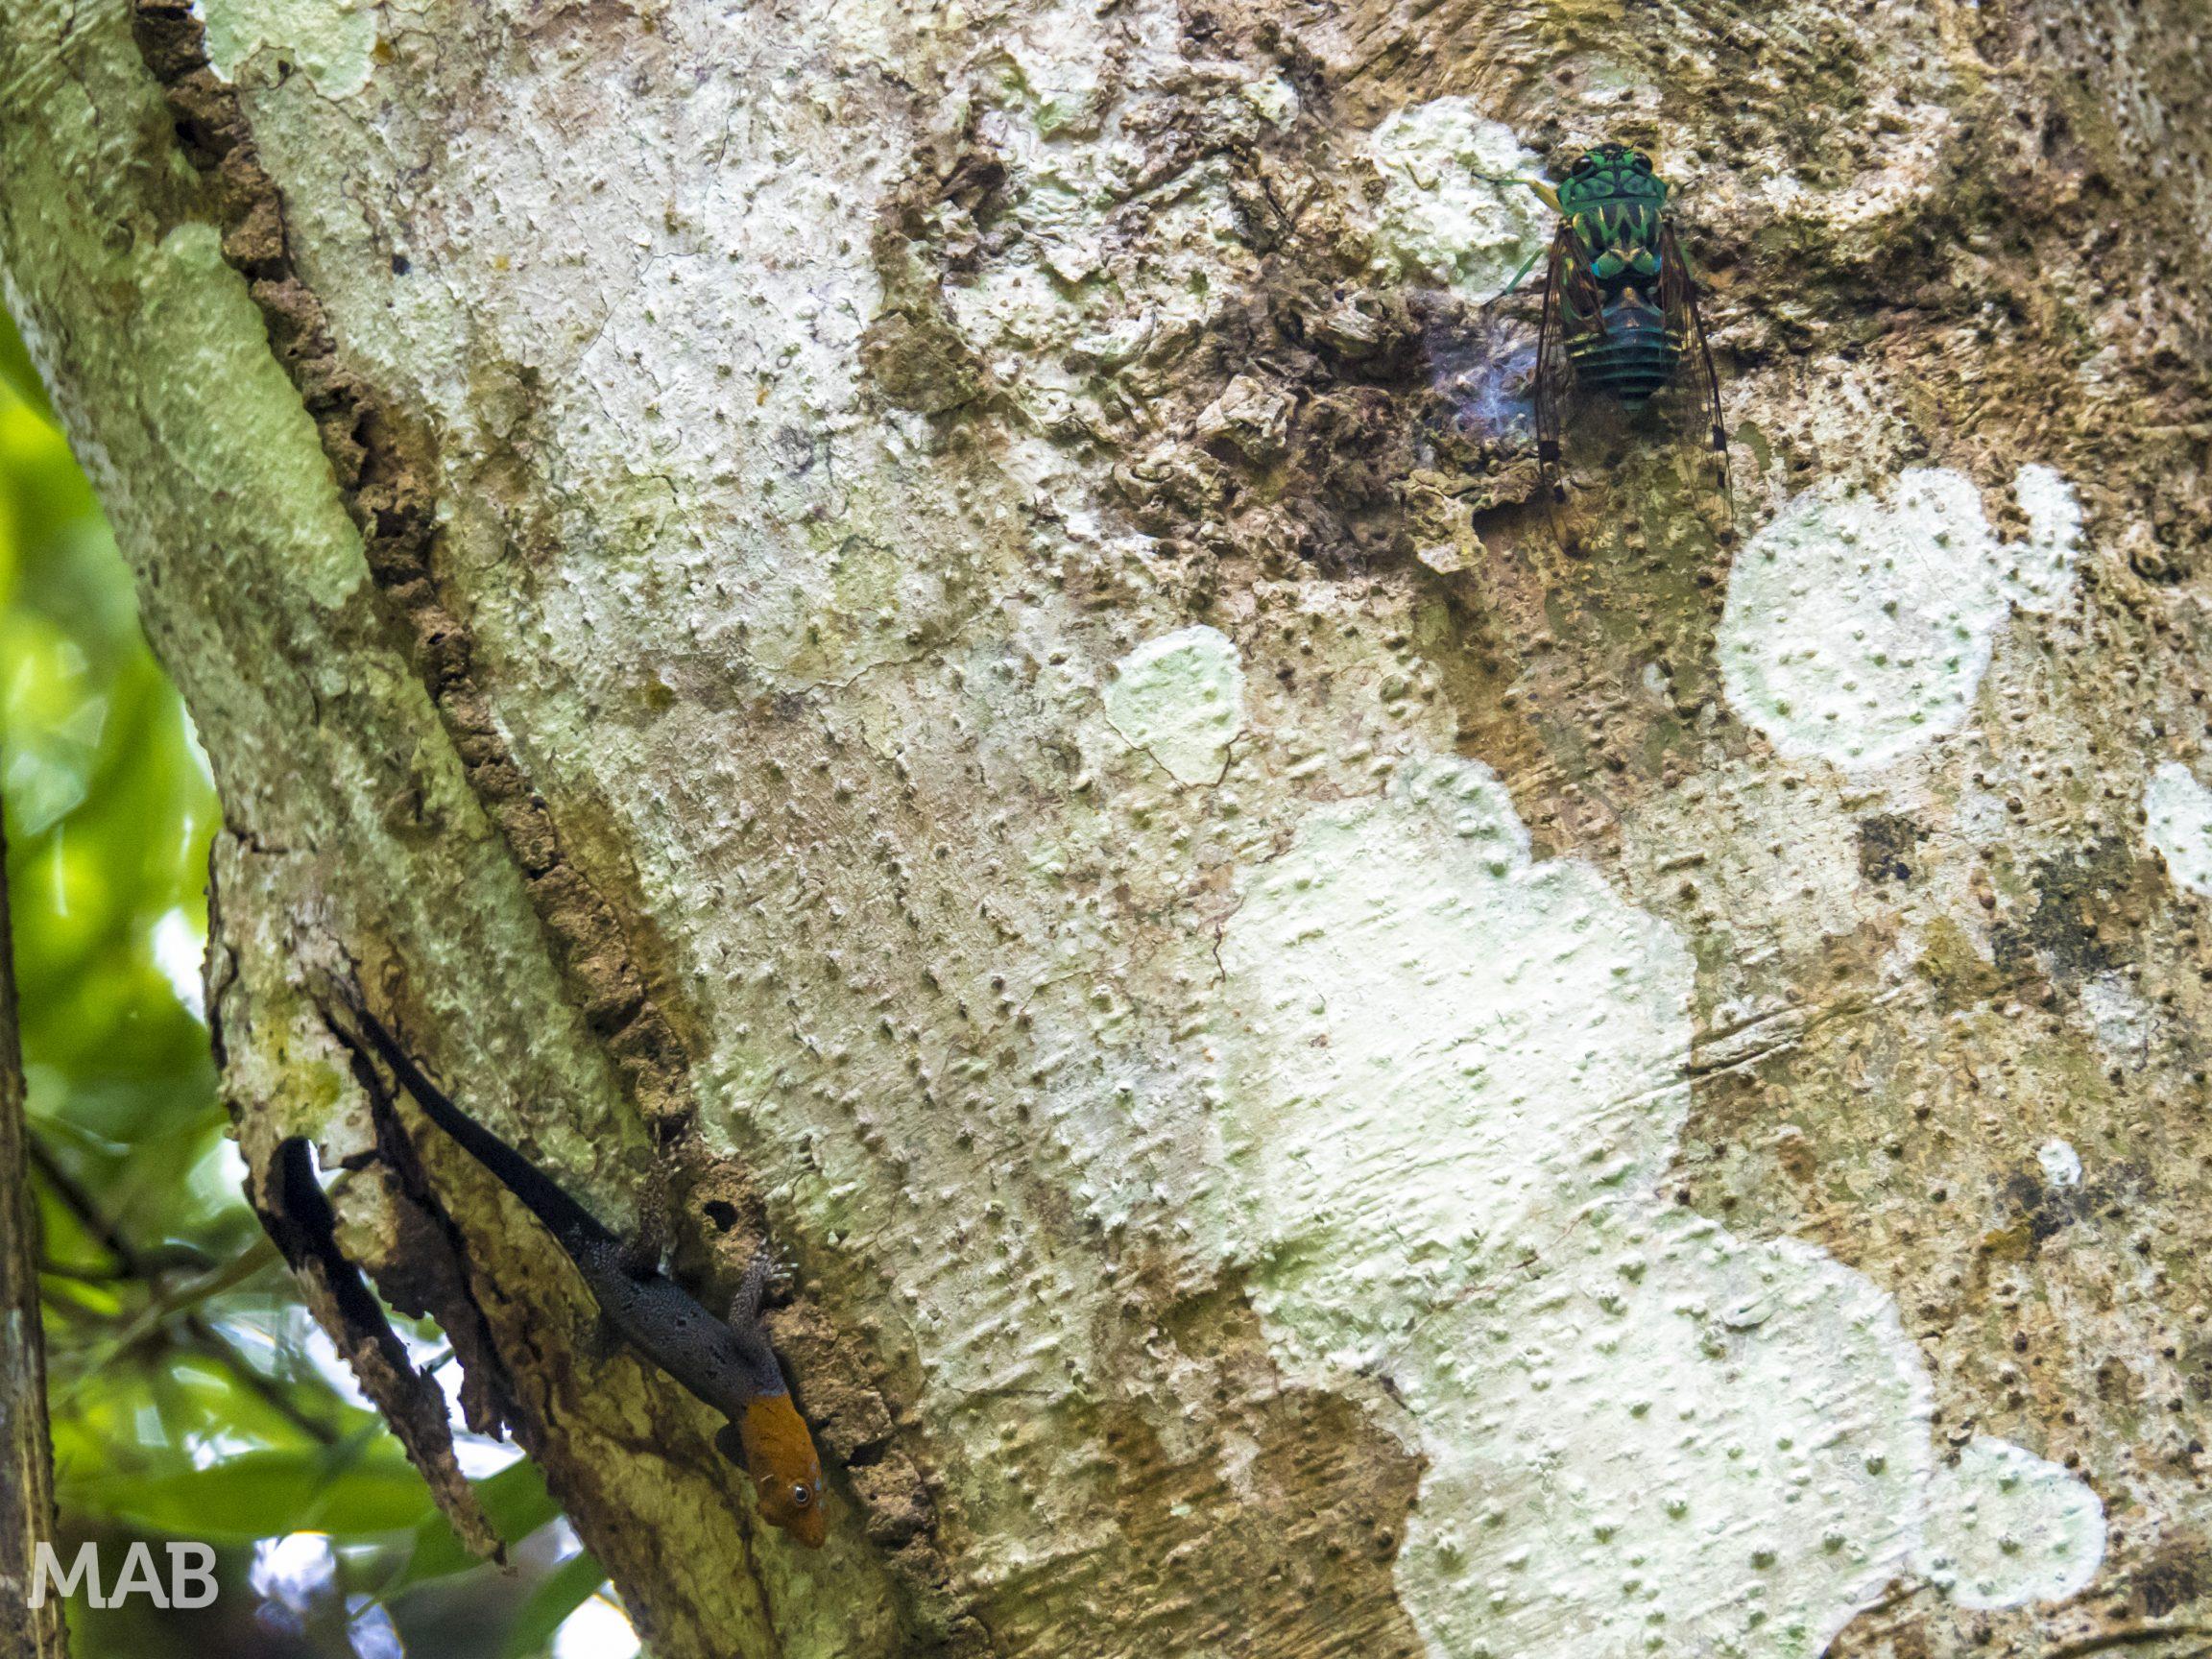 Cicada Meets Lizard